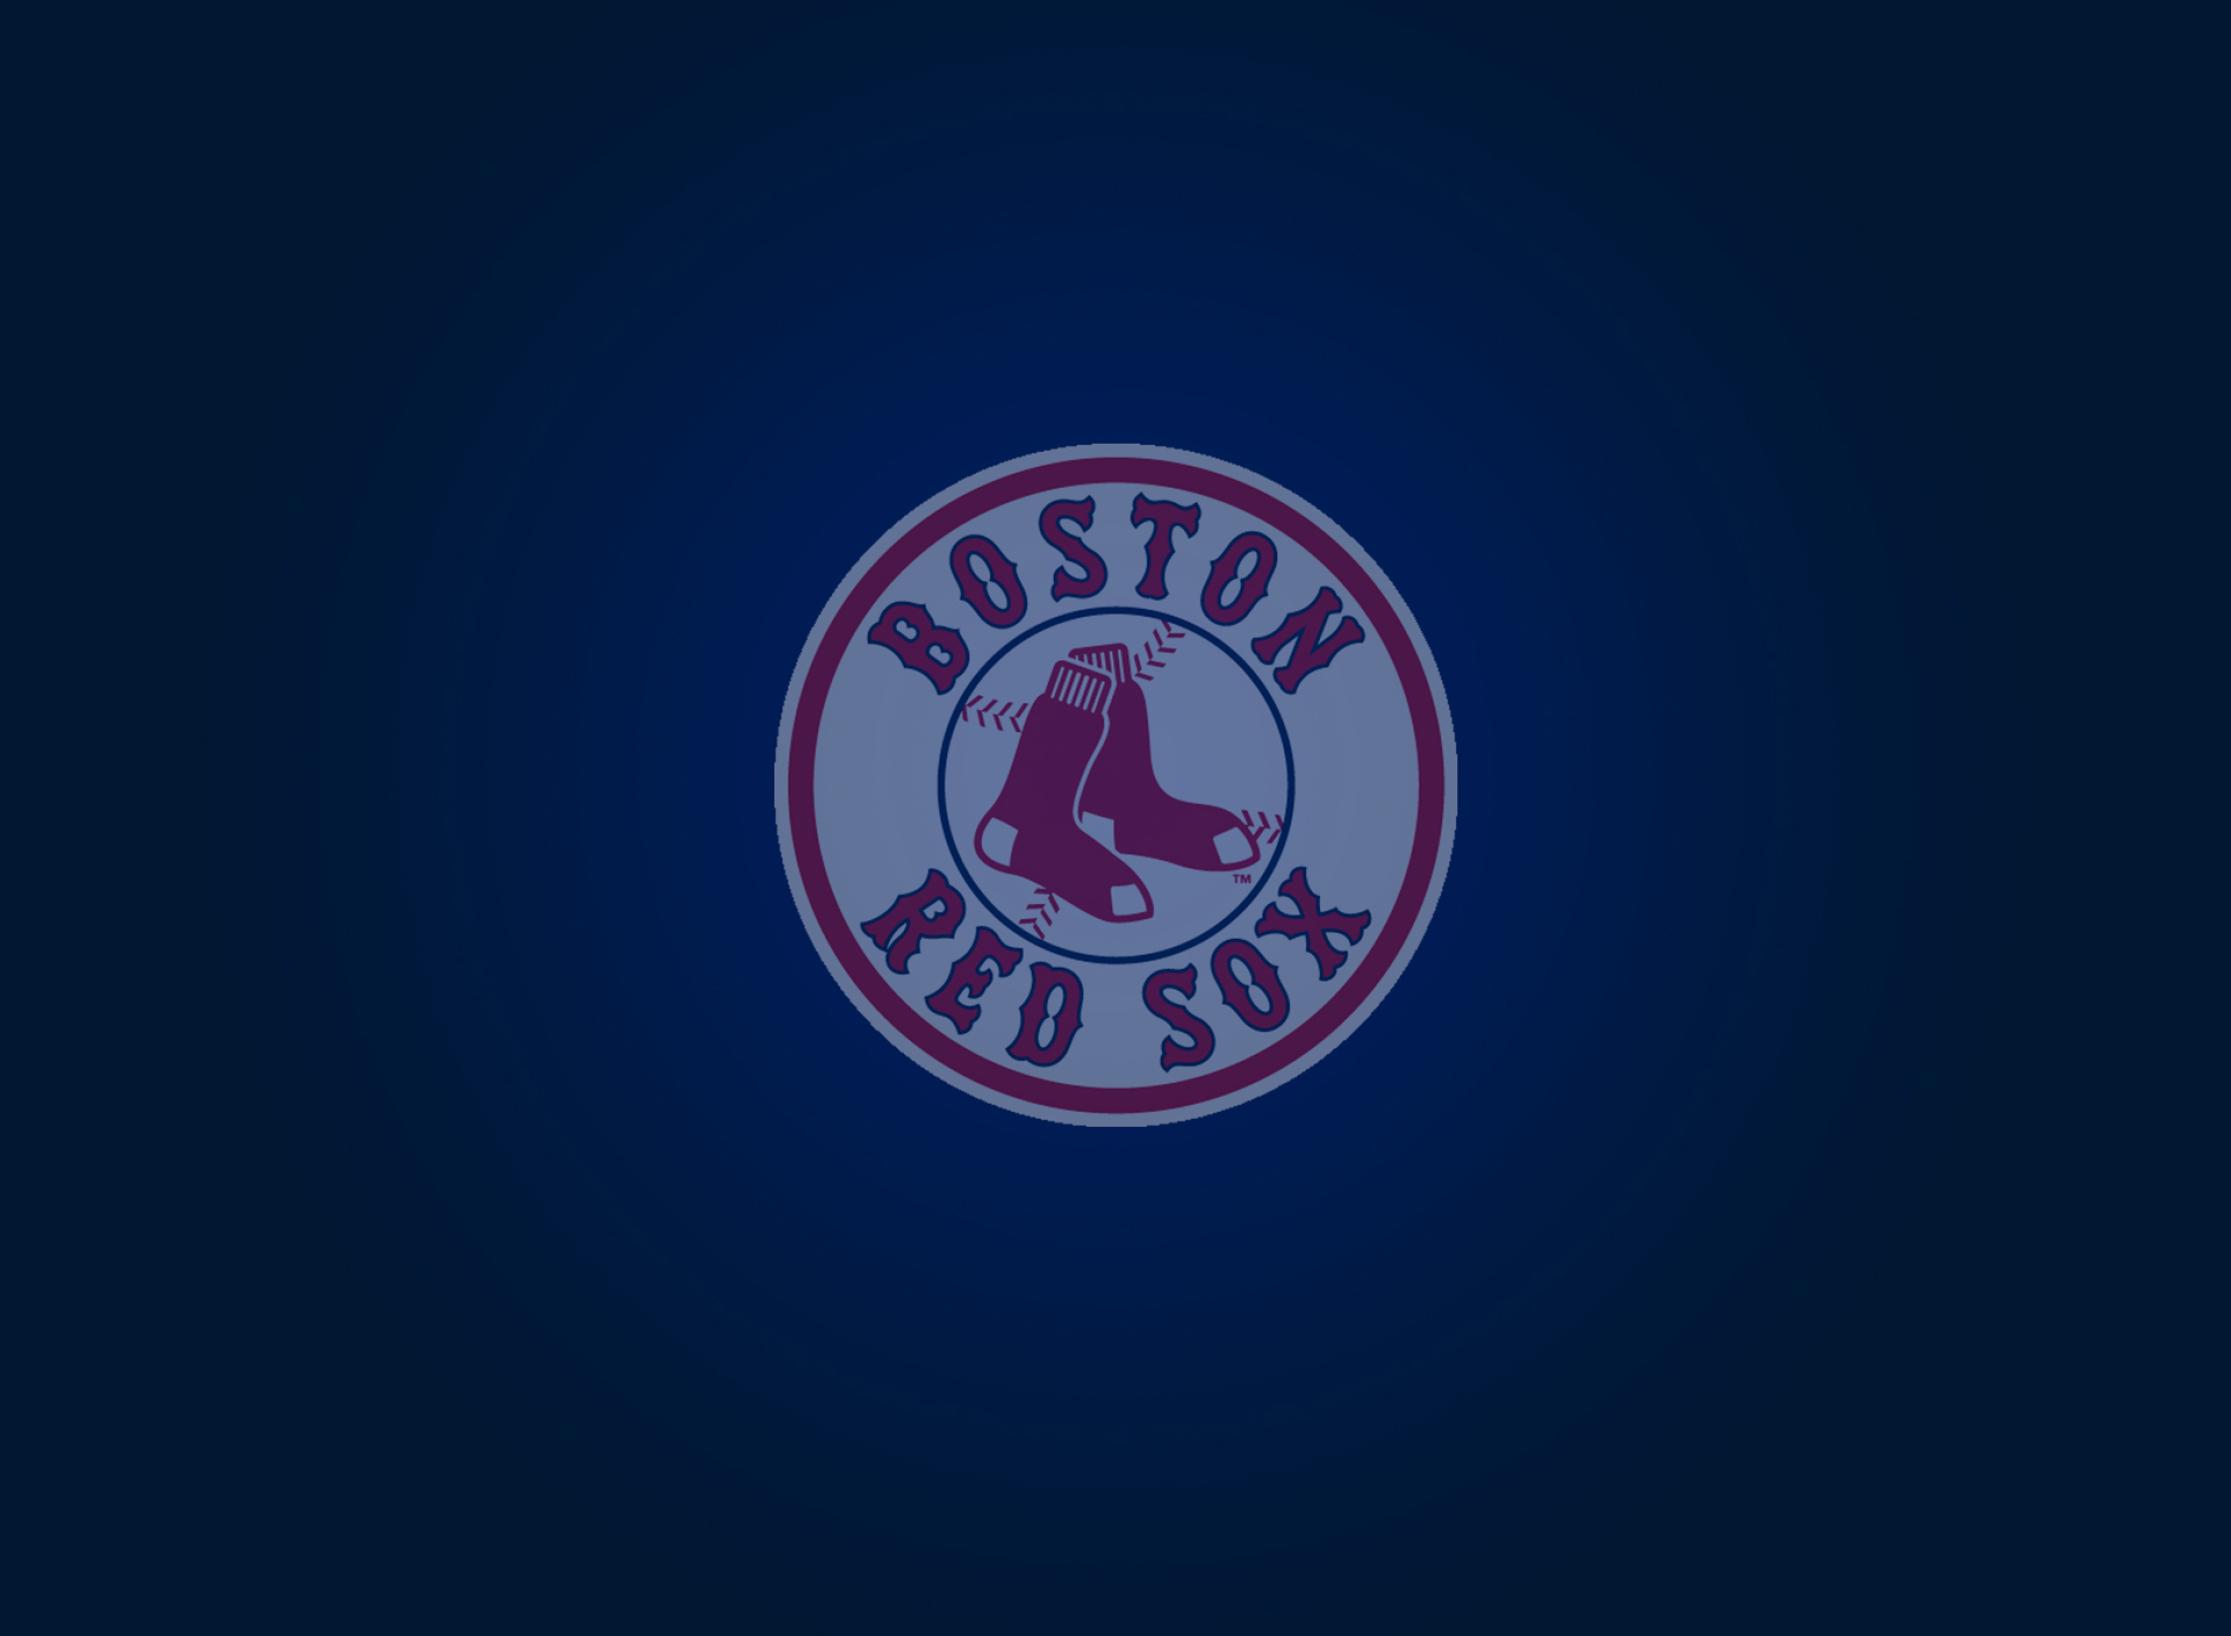 Boston Red Sox Iphone Wallpaper Boston red sox 2231x1636